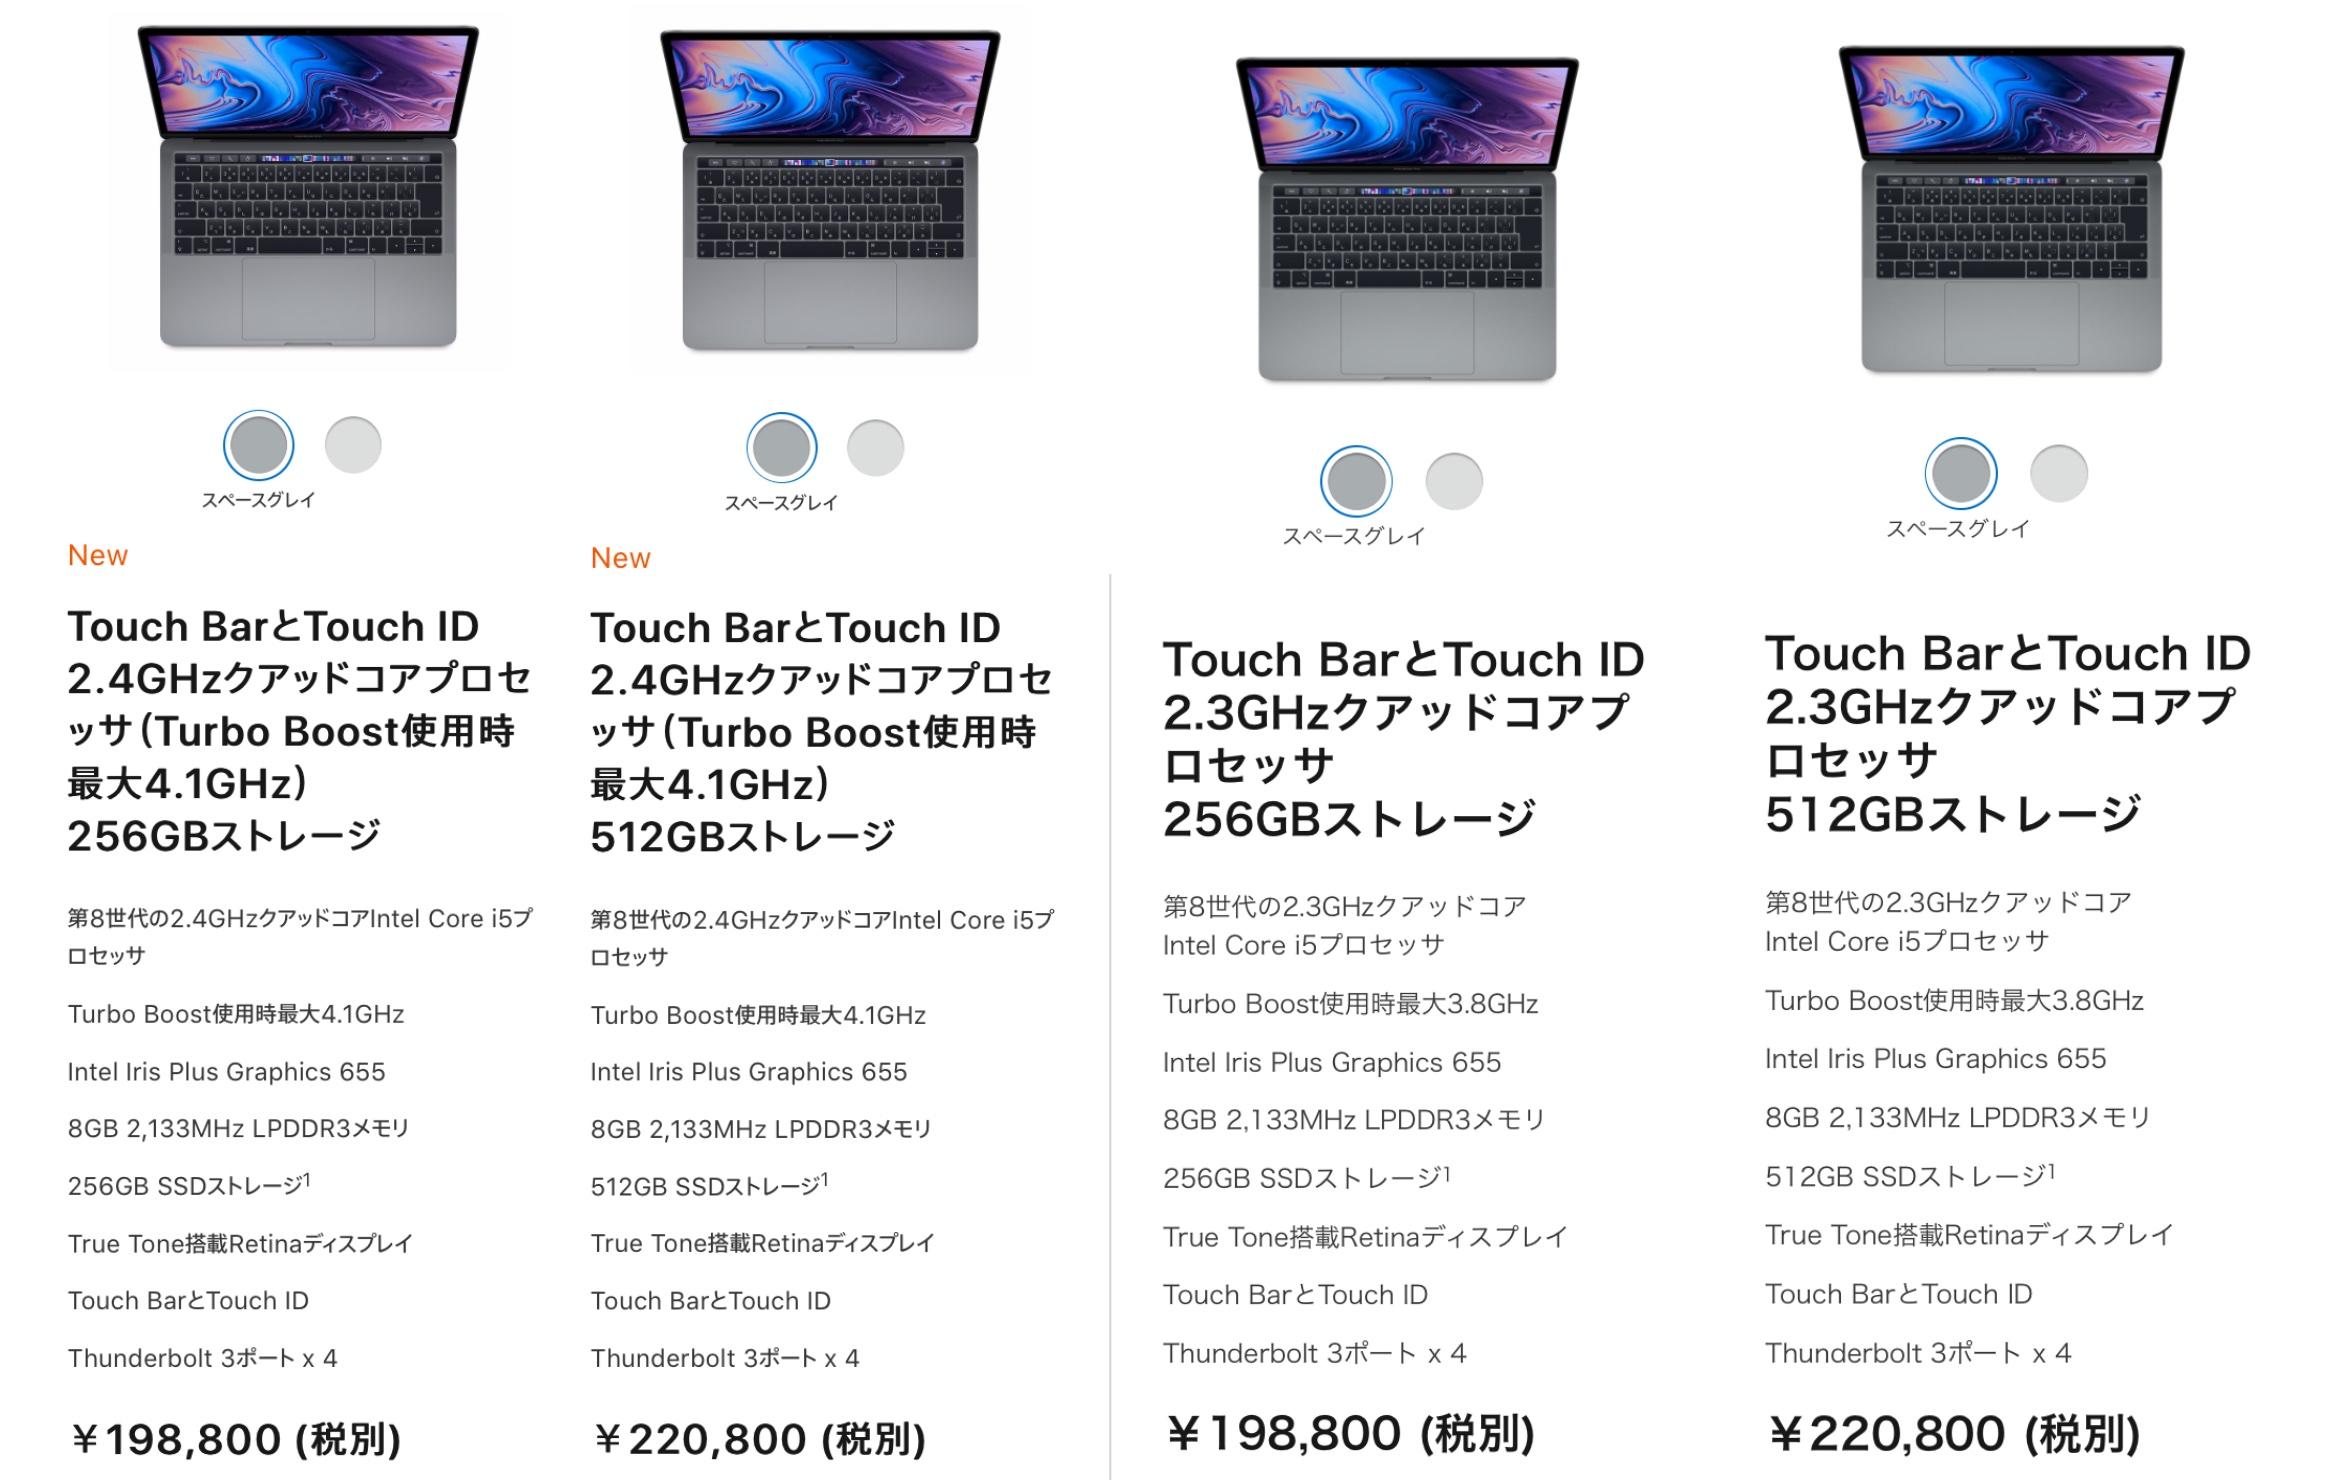 MacBook Pro (13-inch, 2018/2019)の価格とスペック